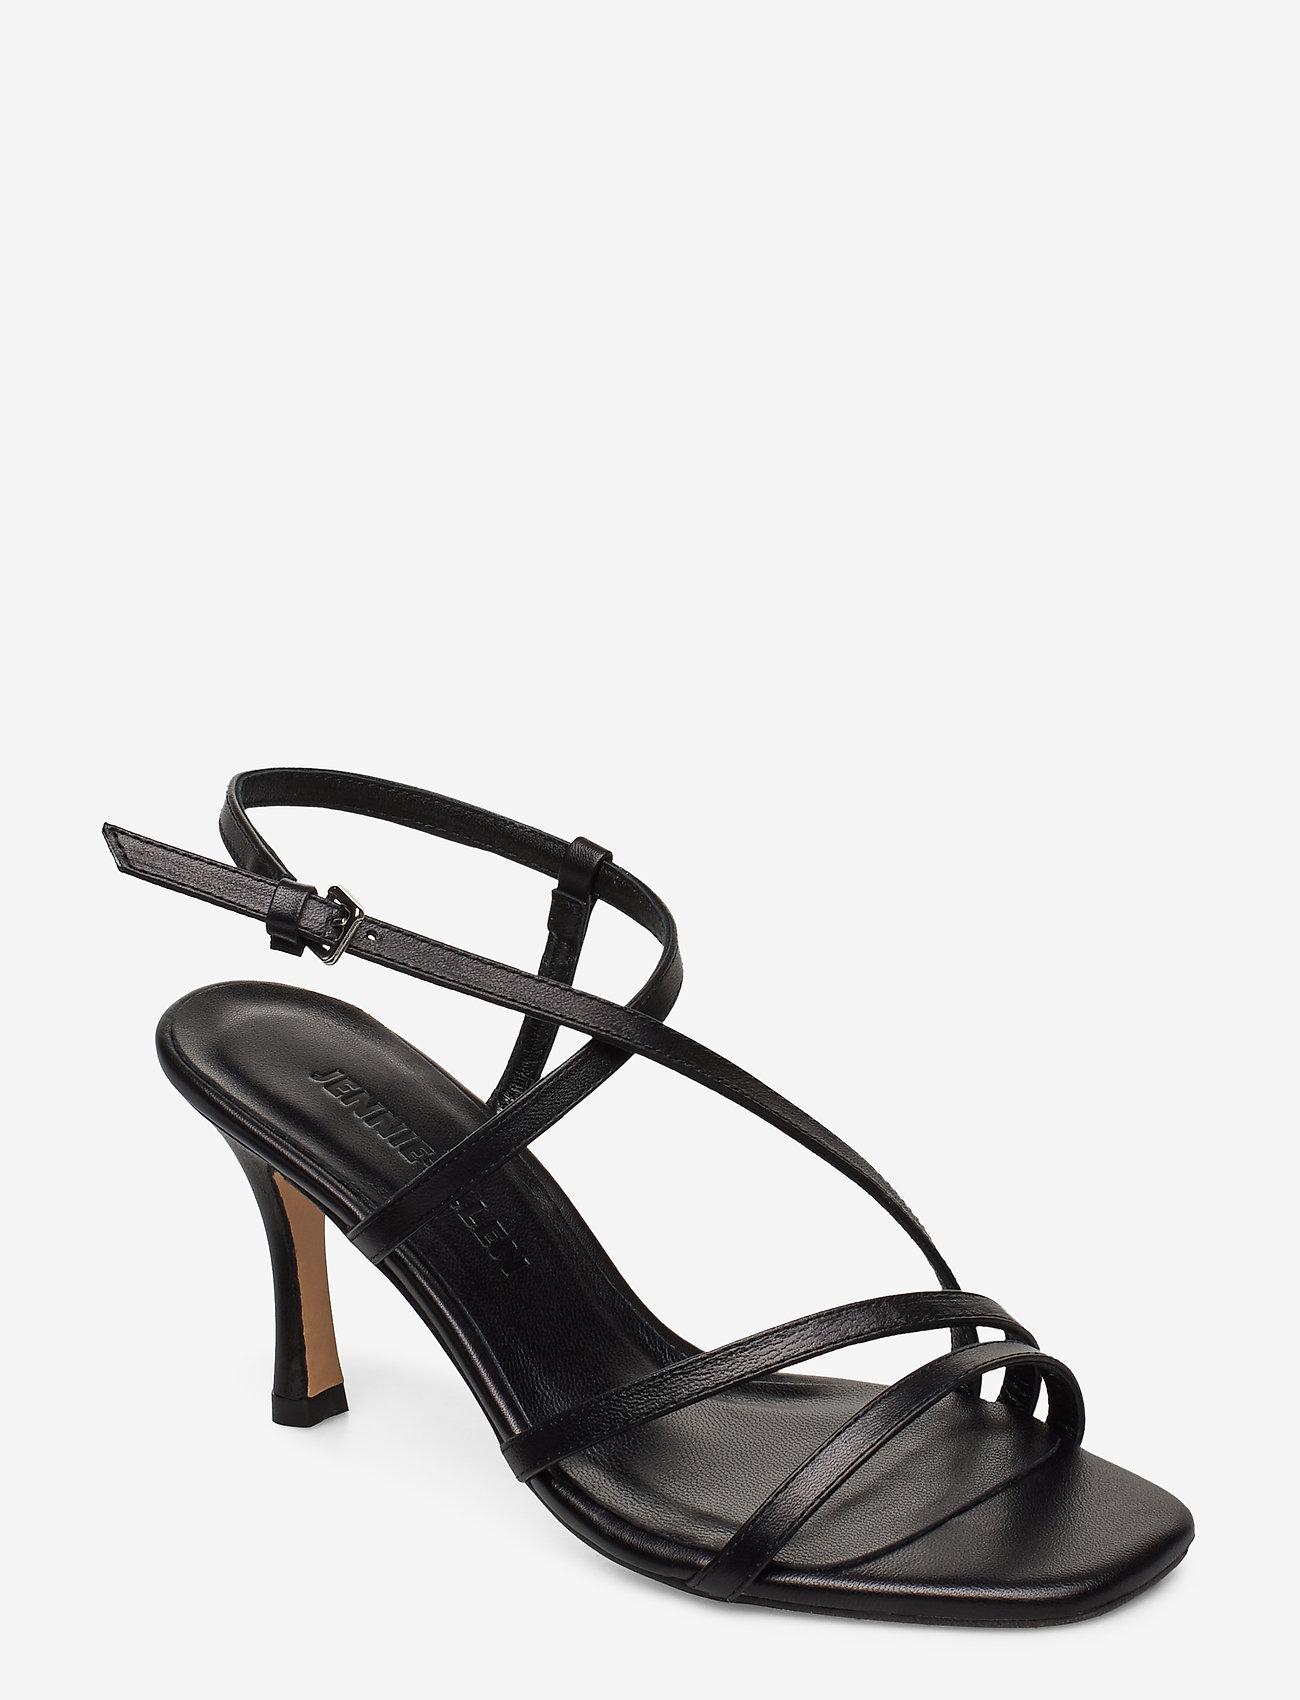 Jennie-Ellen - Anais - høyhælte sandaler - black leather